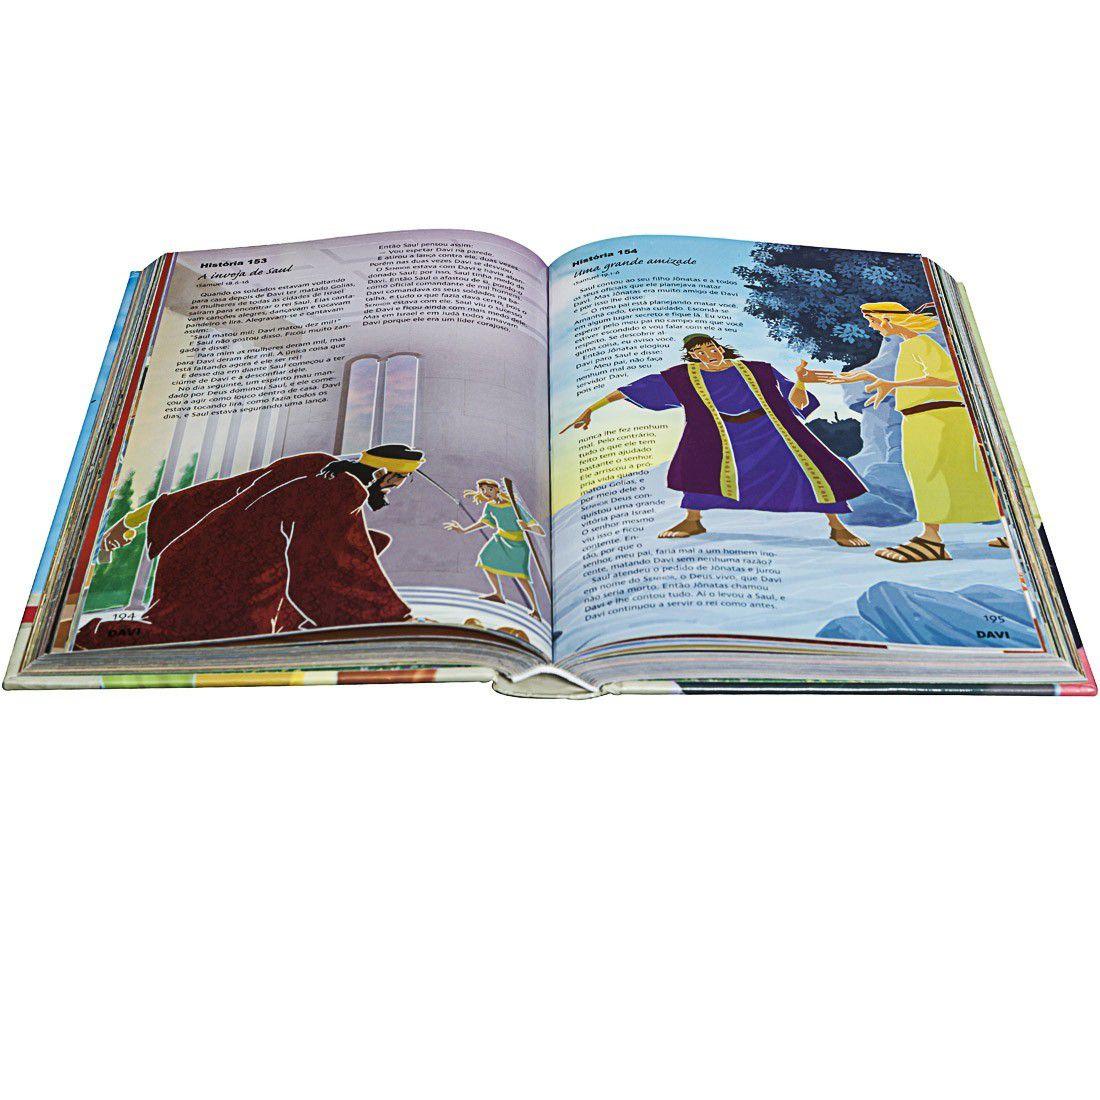 Bíblia Sagrada - 365 Histórias Ilustradas